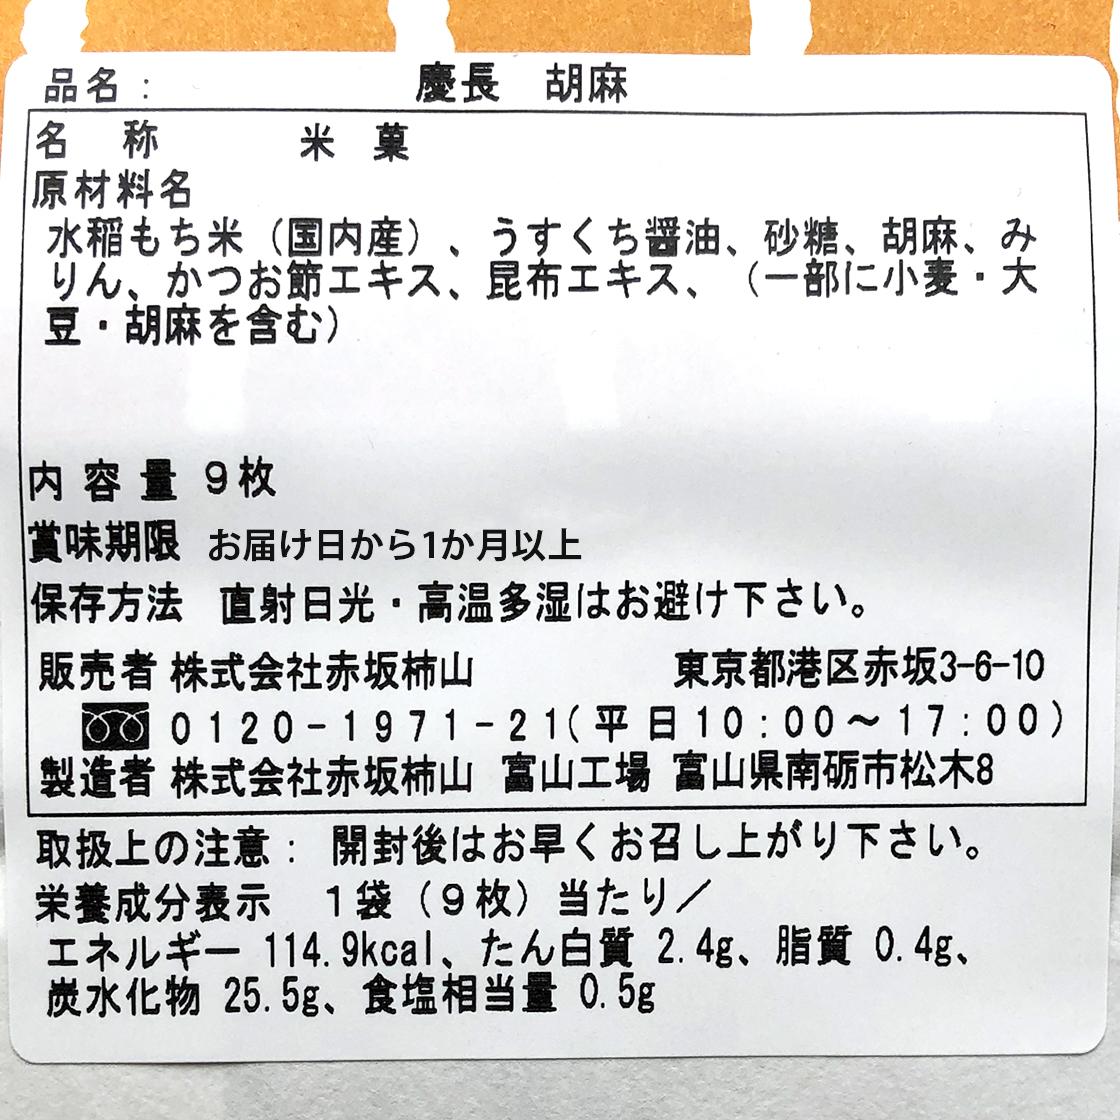 立ち袋/3種類[赤坂柿山] 24